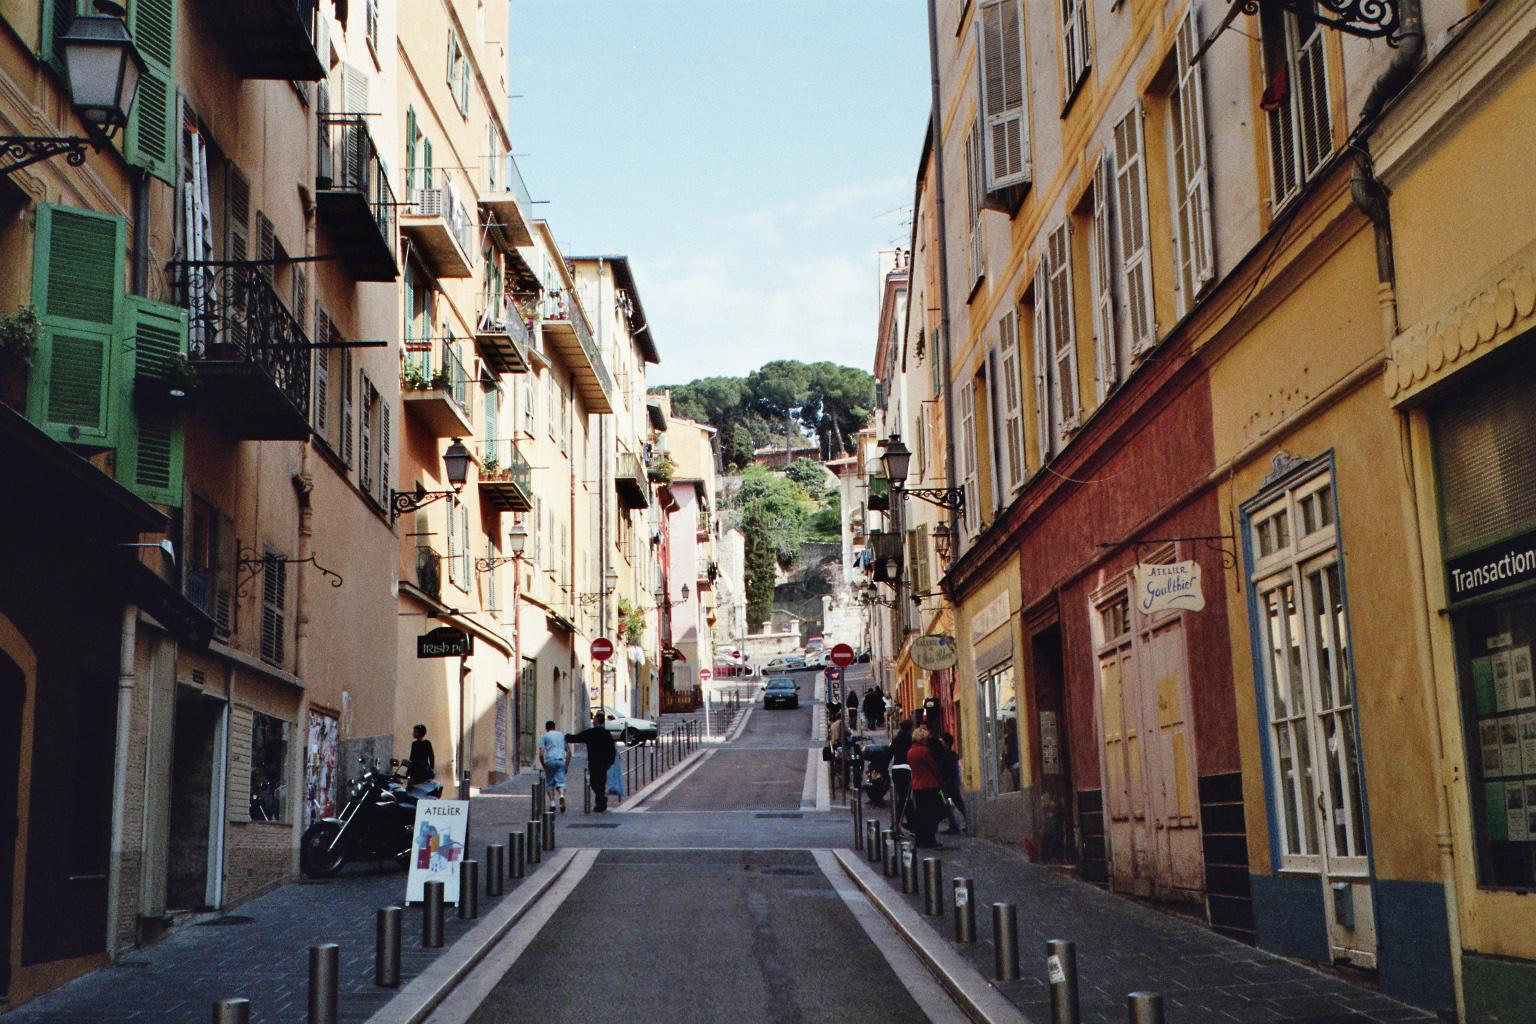 Old Town (Vieille Ville)